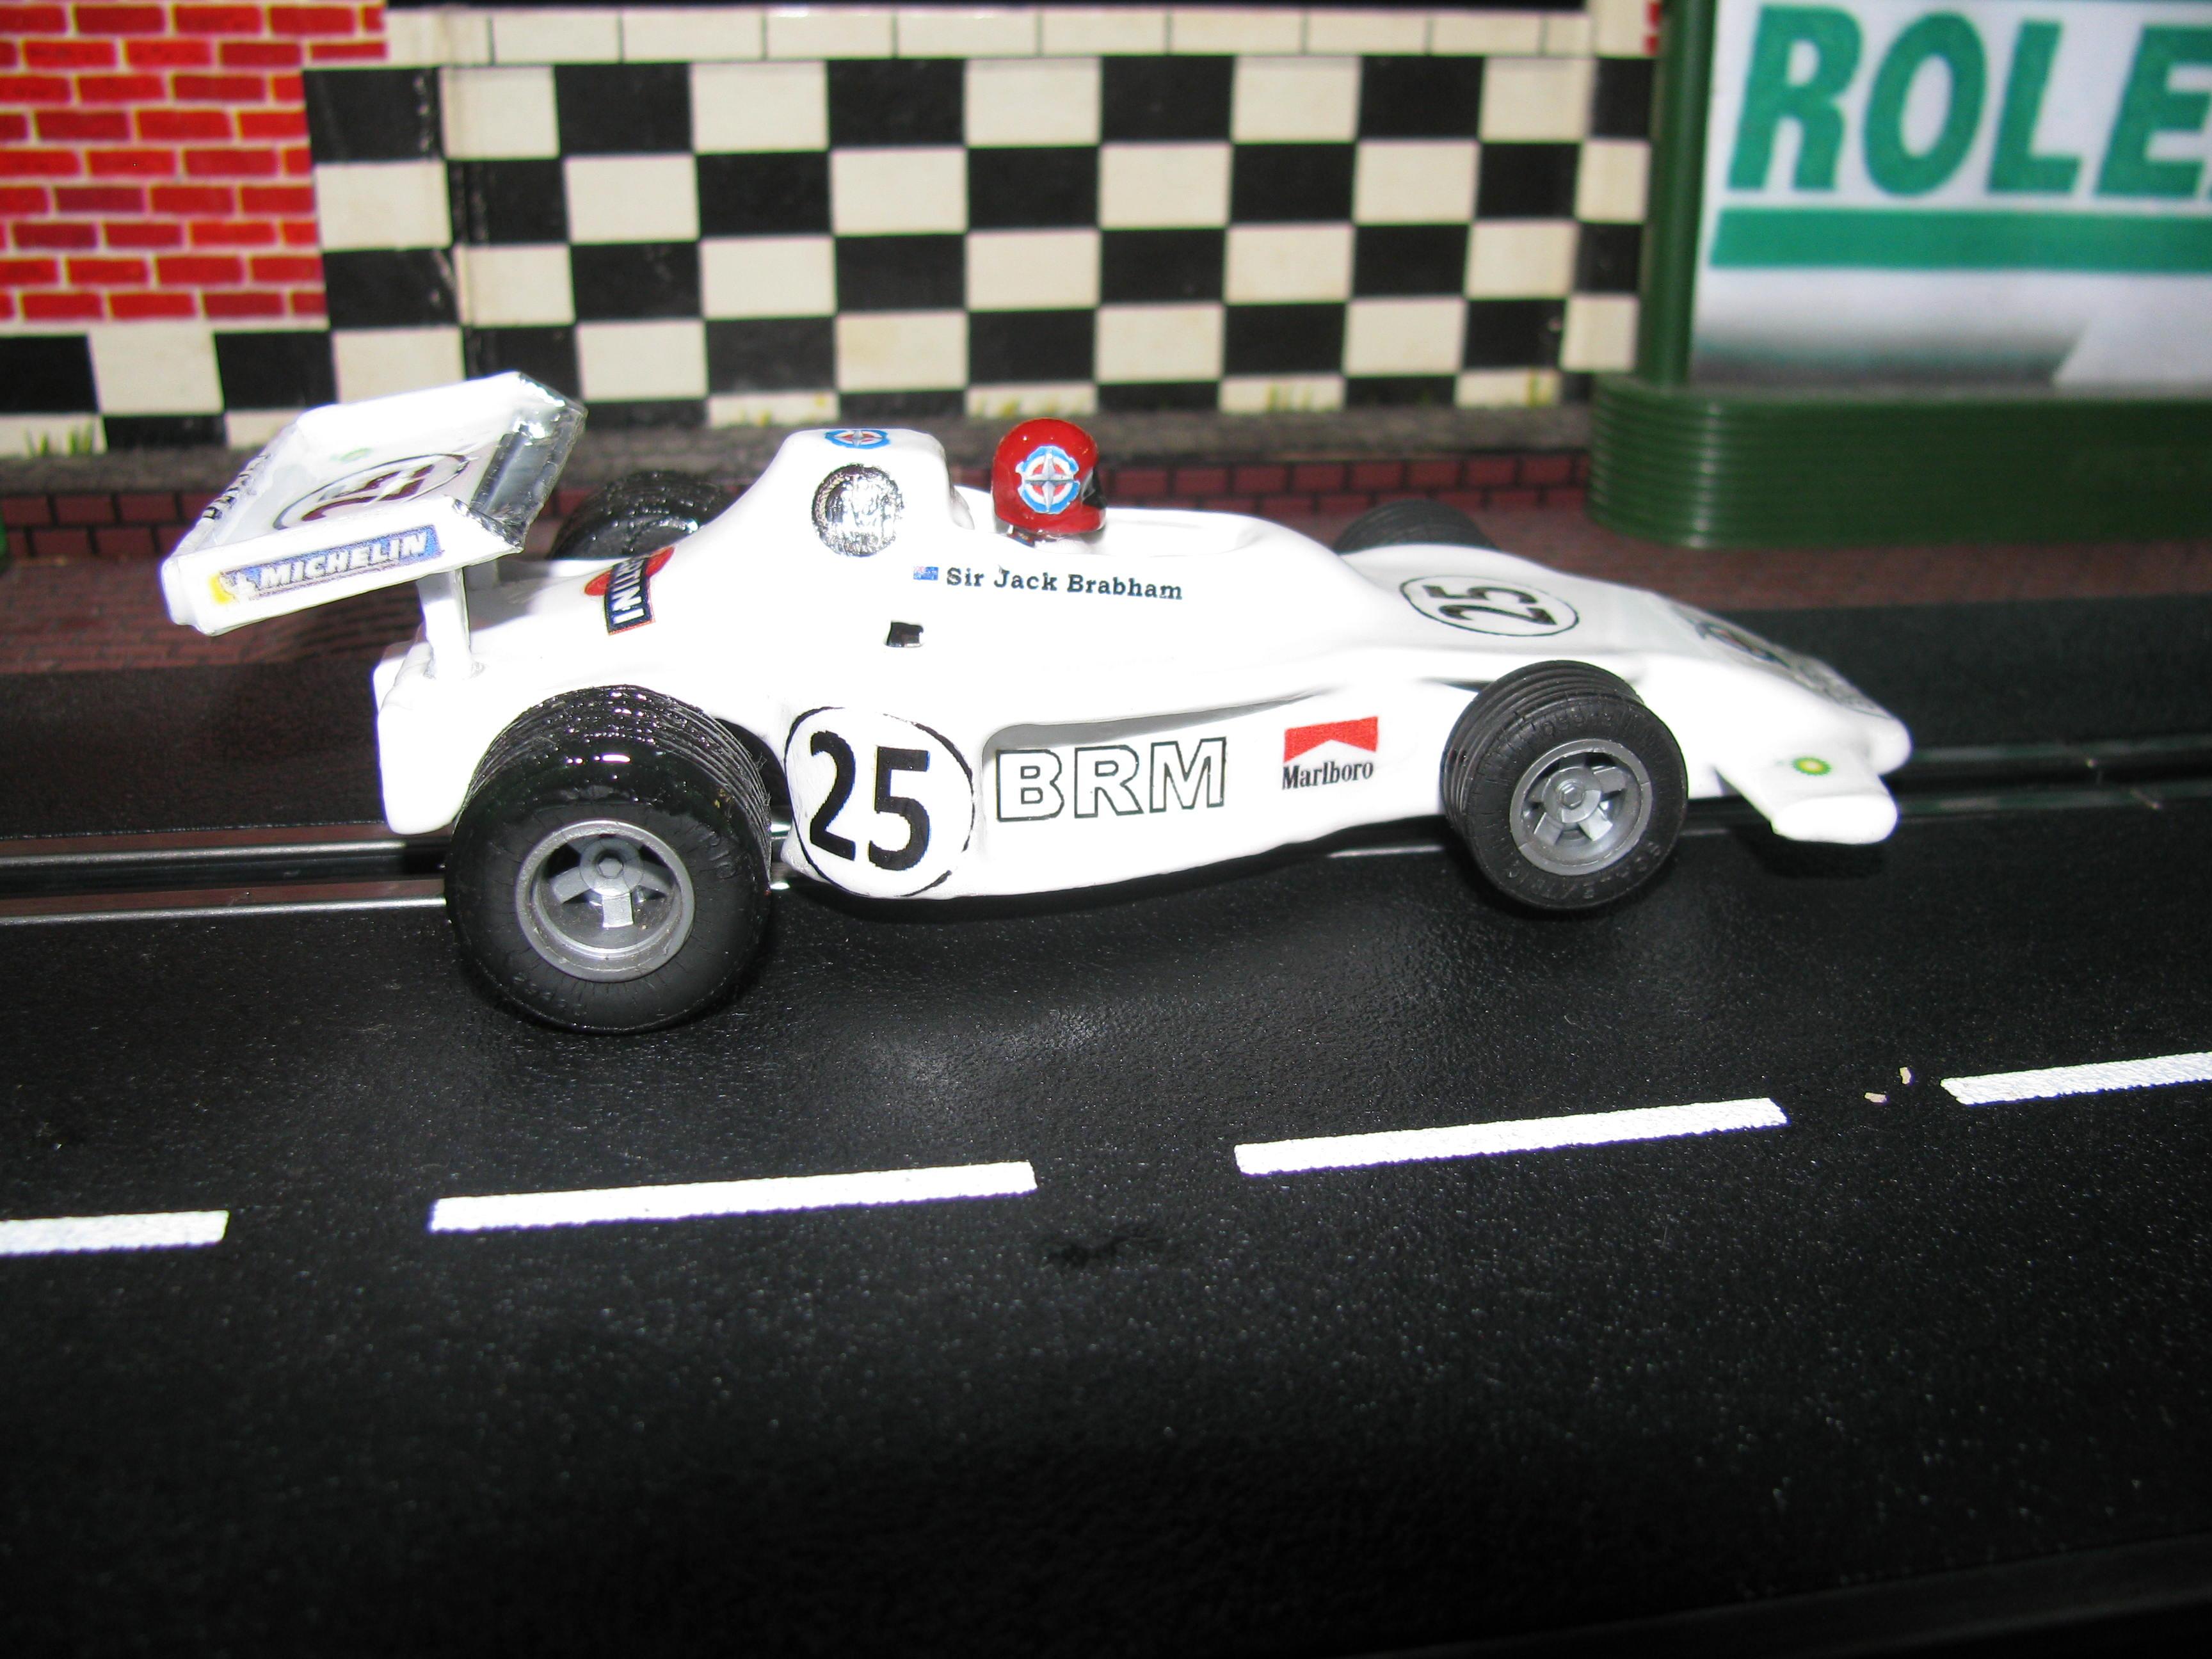 Scalextric Shadow F1 - Car 25 - Custom livery